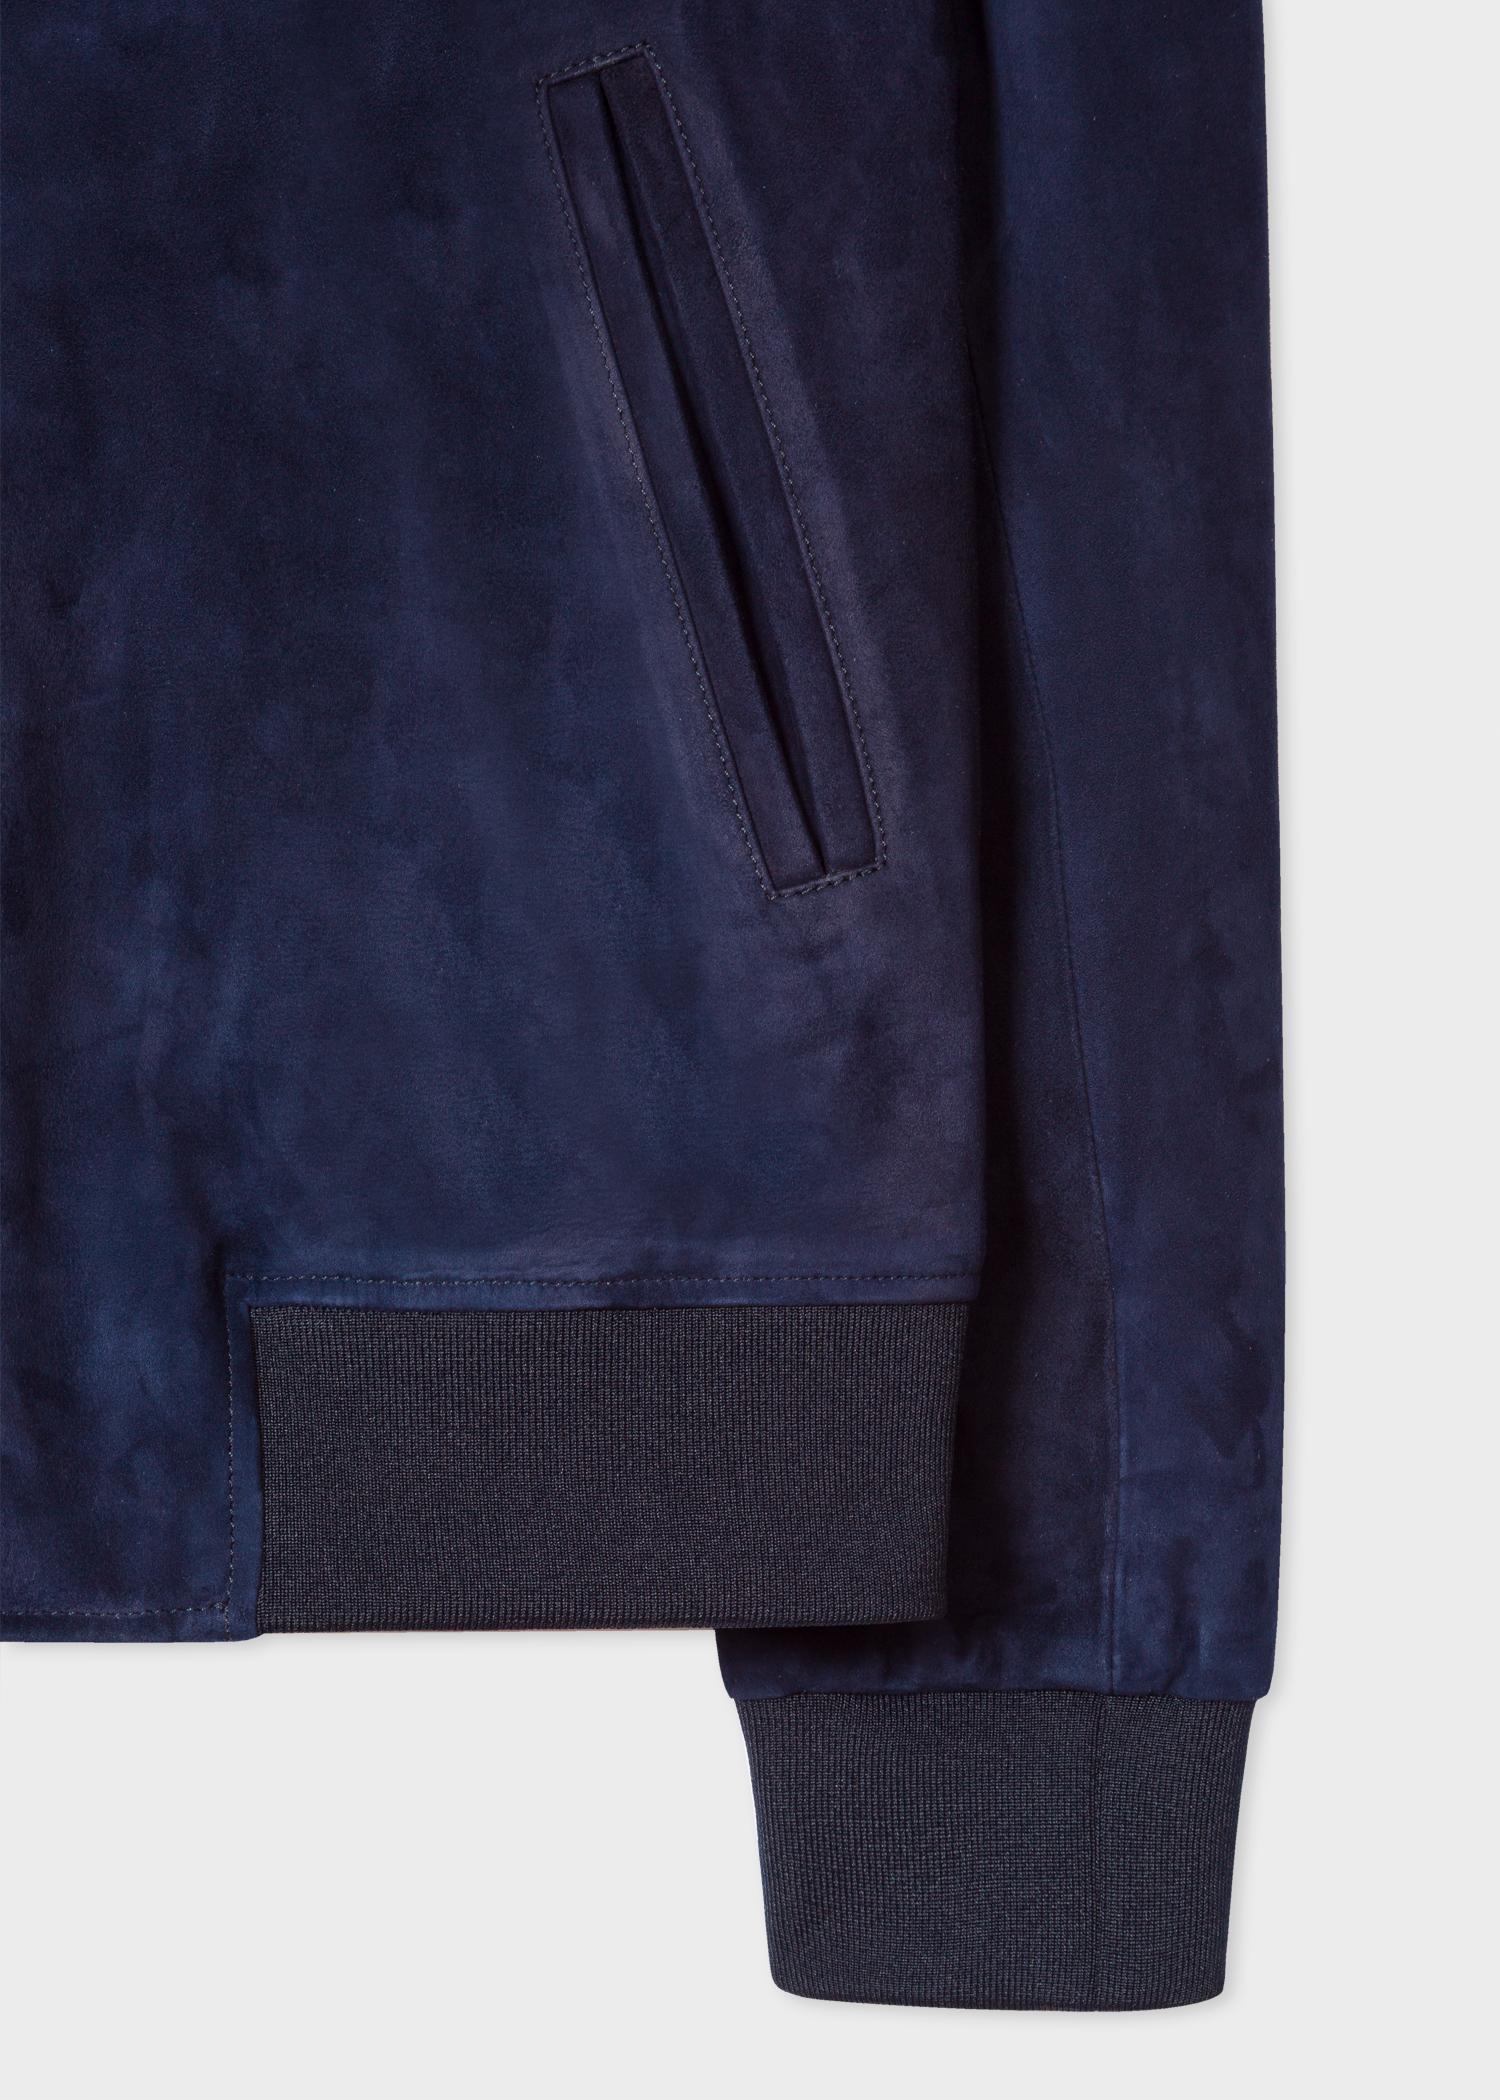 Men S Indigo Suede Bomber Jacket With Artist Stripe Cuff Linings Paul Smith Us